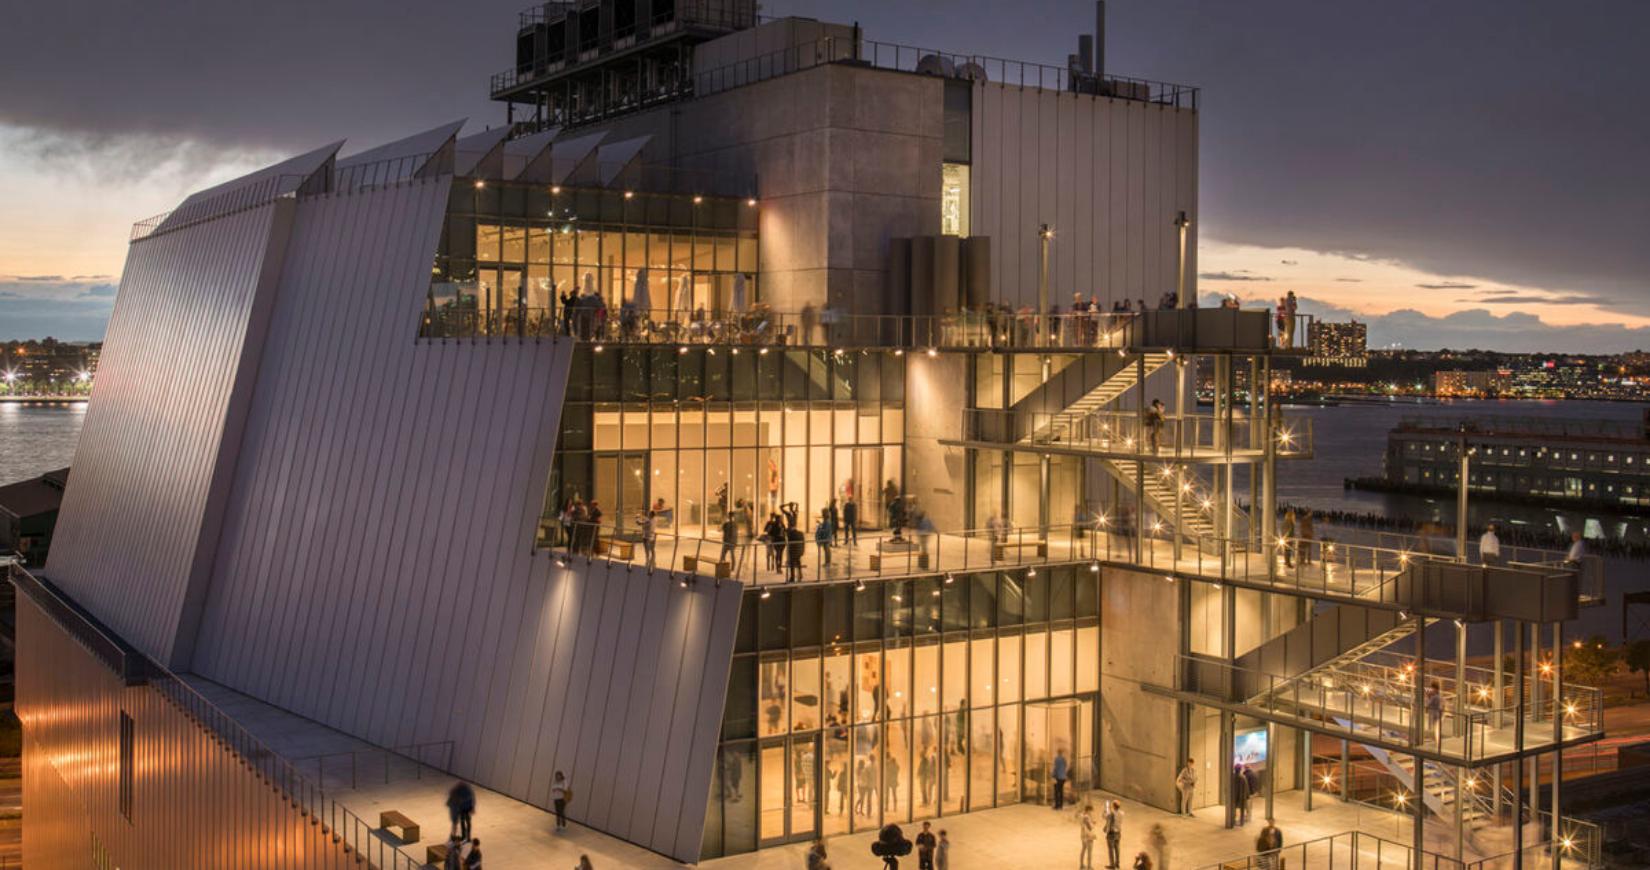 The Whitney Museum of Art New York city